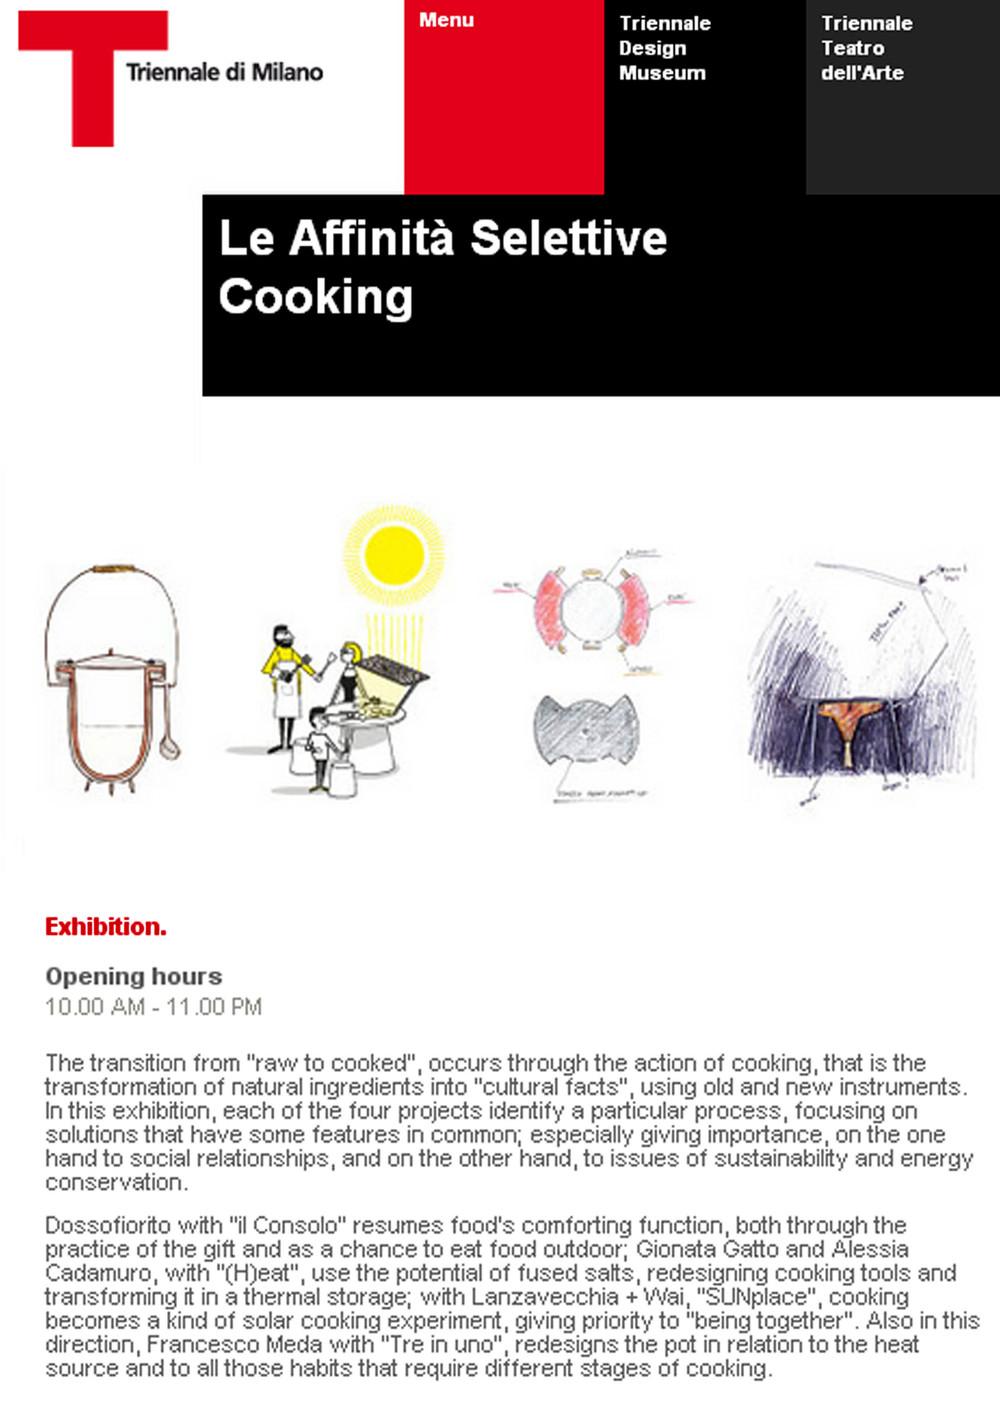 Triennale+di+Milano.jpg